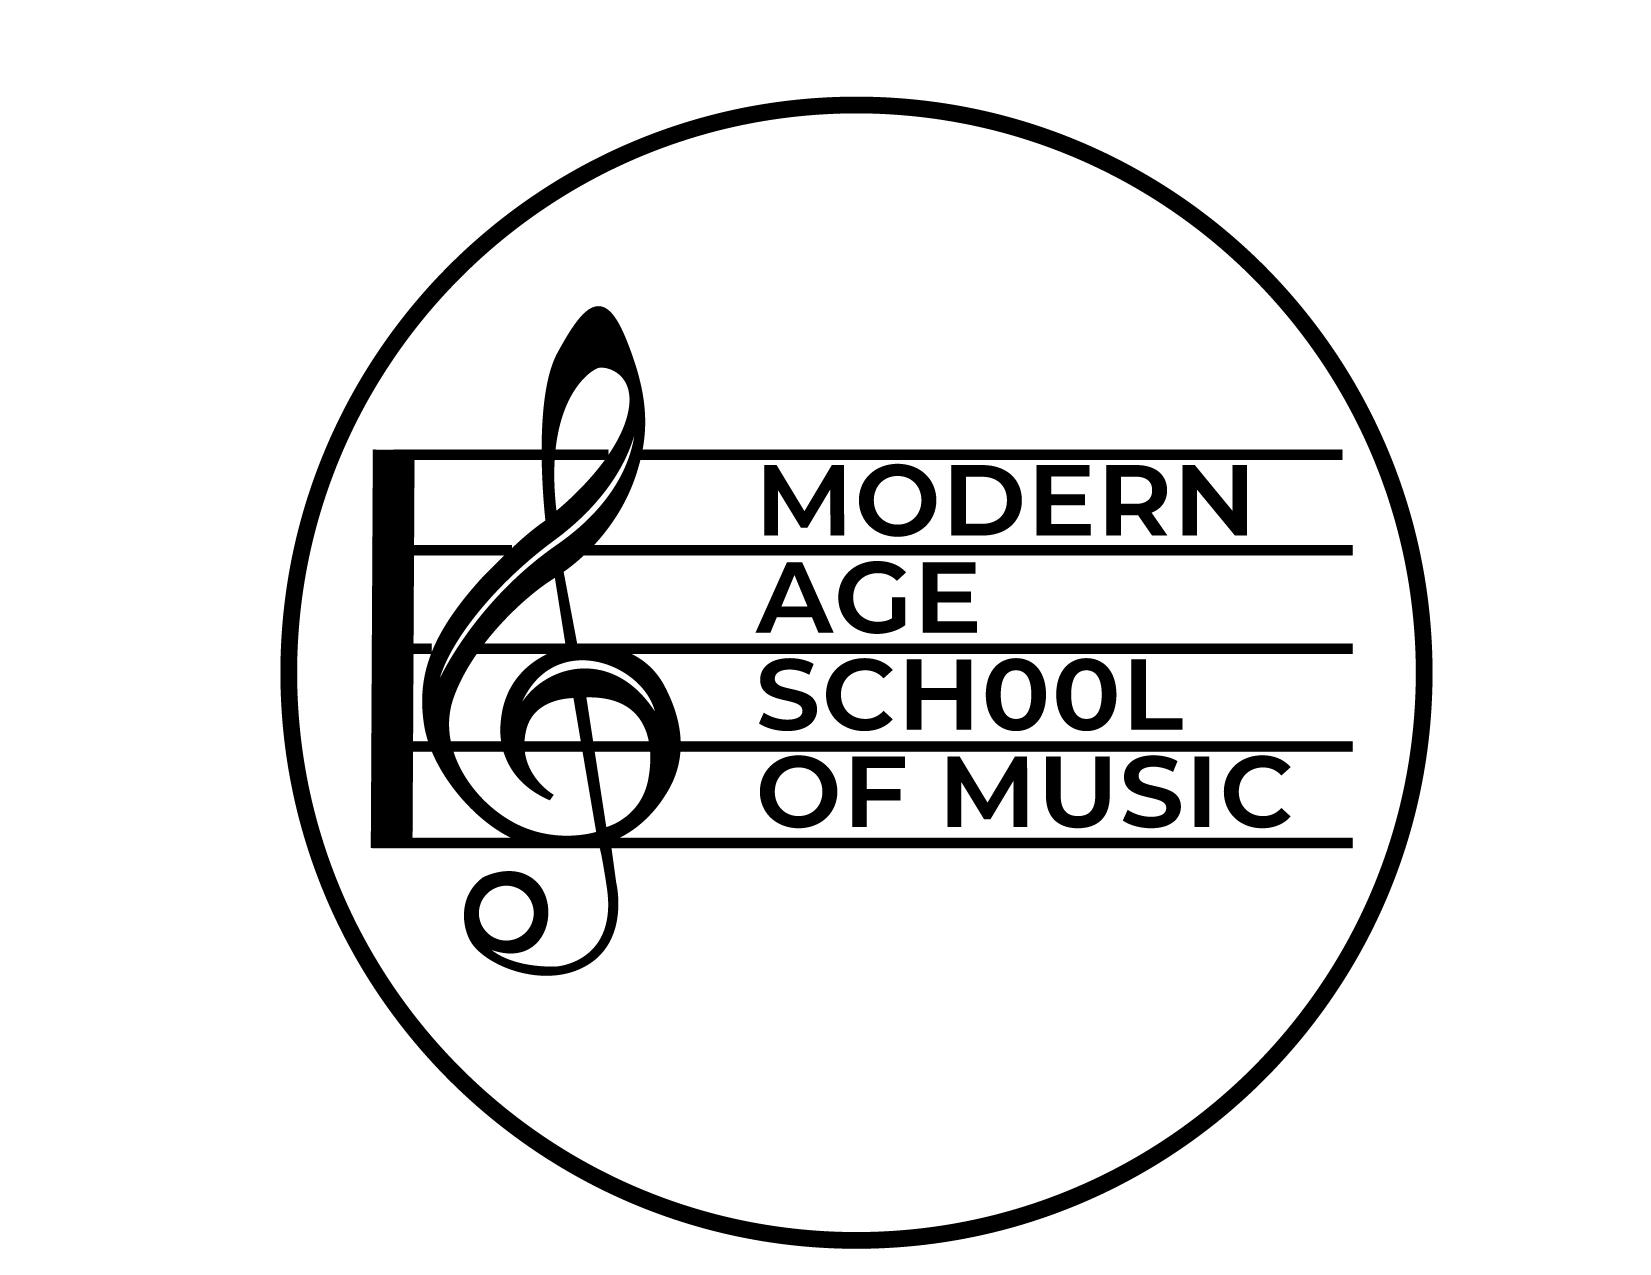 Modern Age School of Music